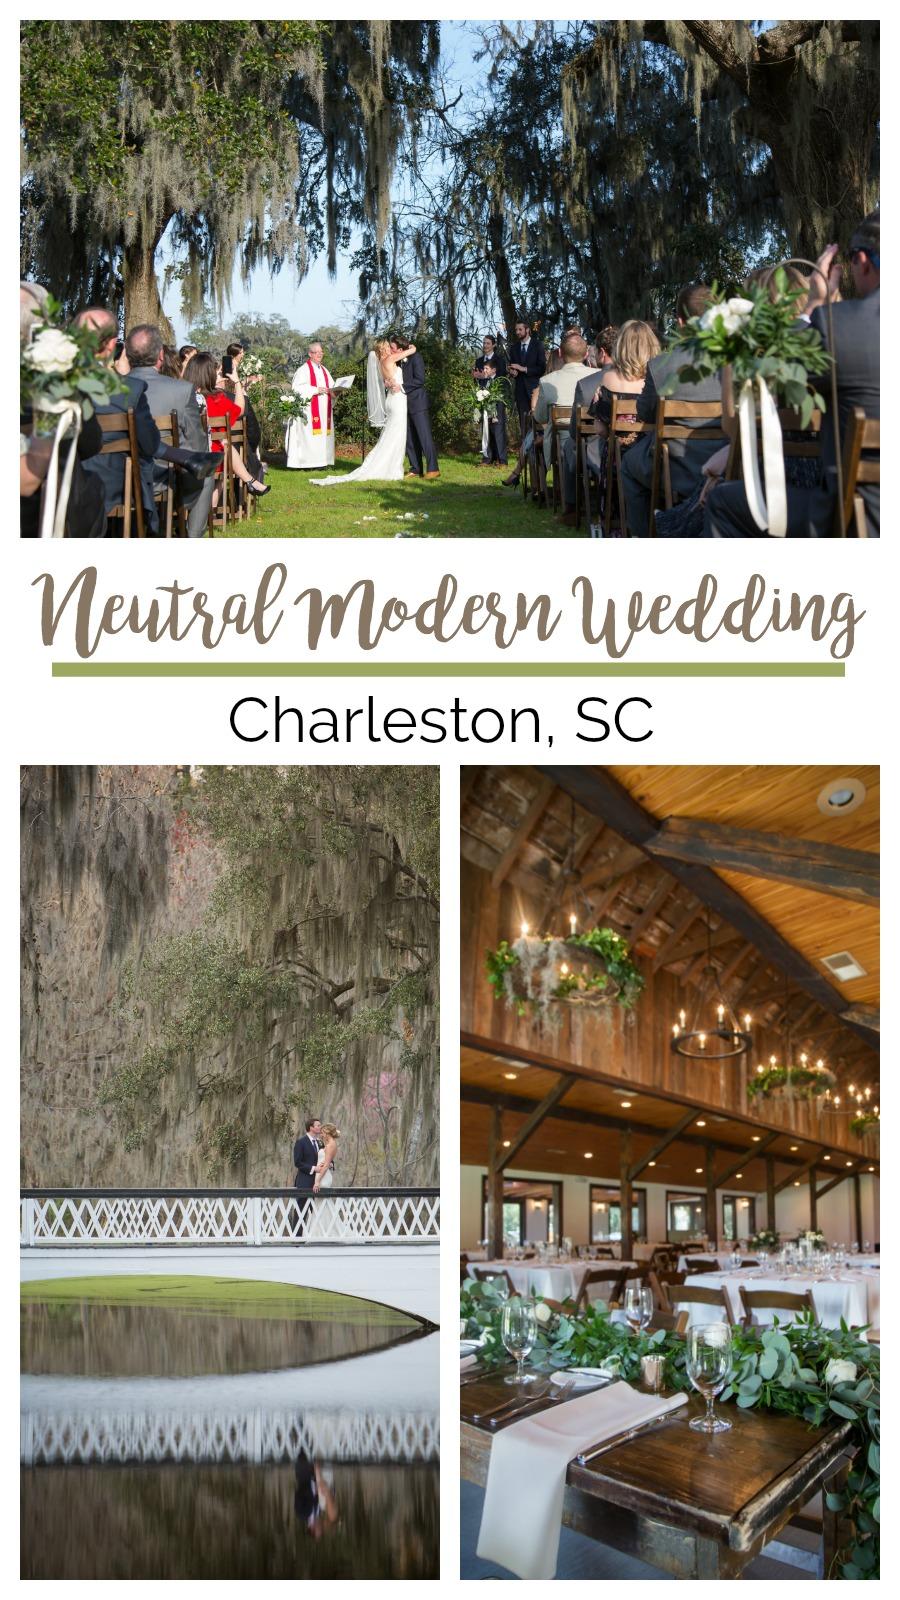 Nicole and Michael: Neutral Modern Wedding at Magnolia Plantation, Charleston, South Carolina | Palmetto State Weddings | MCG Photography | romantic wedding | plantation wedding | white and beige wedding